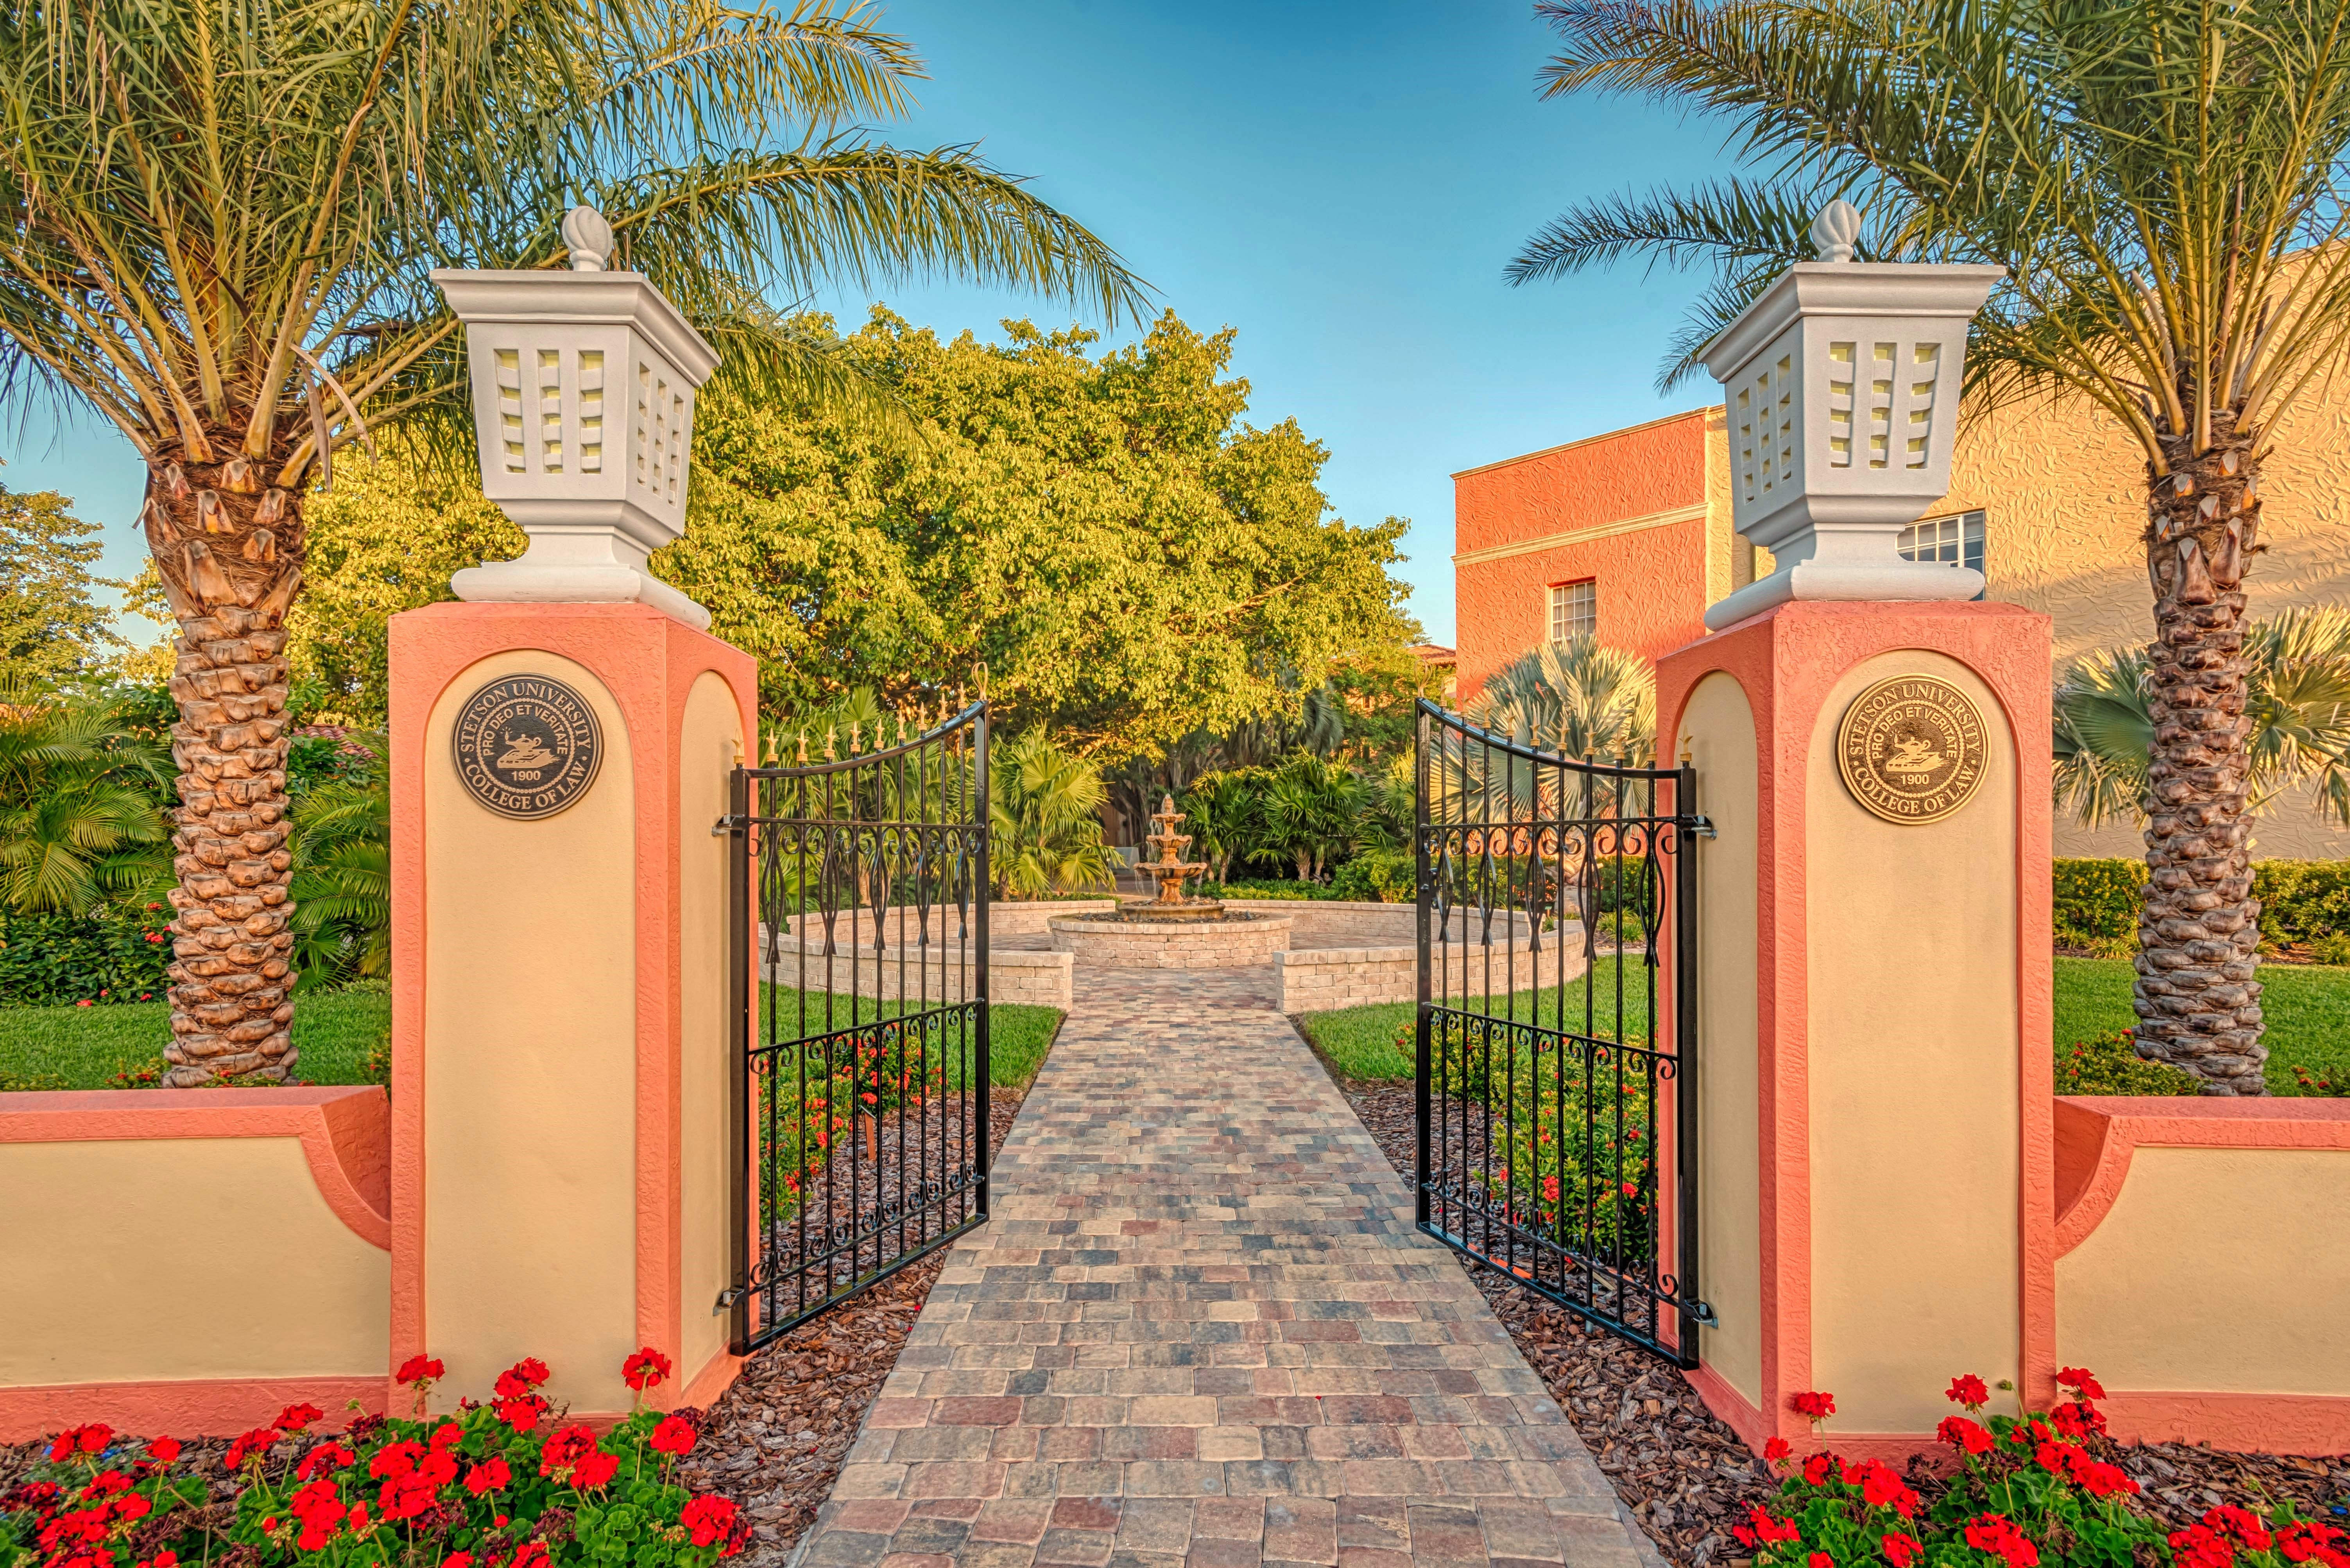 Stetson Law Entrance Gate